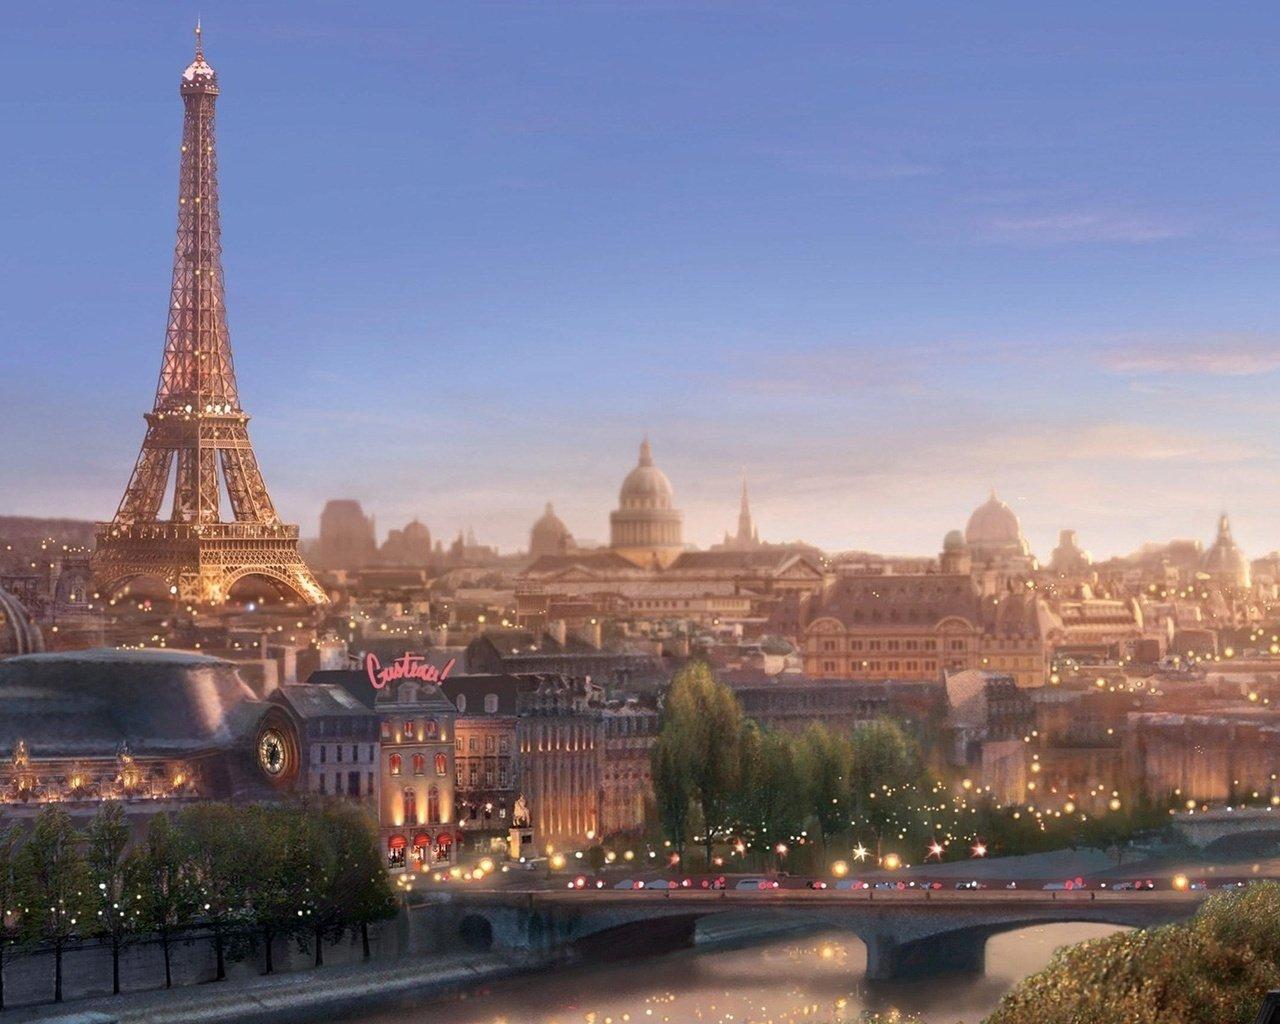 Wallpaper Love Quotes Hd Paris Paris Wallpaper